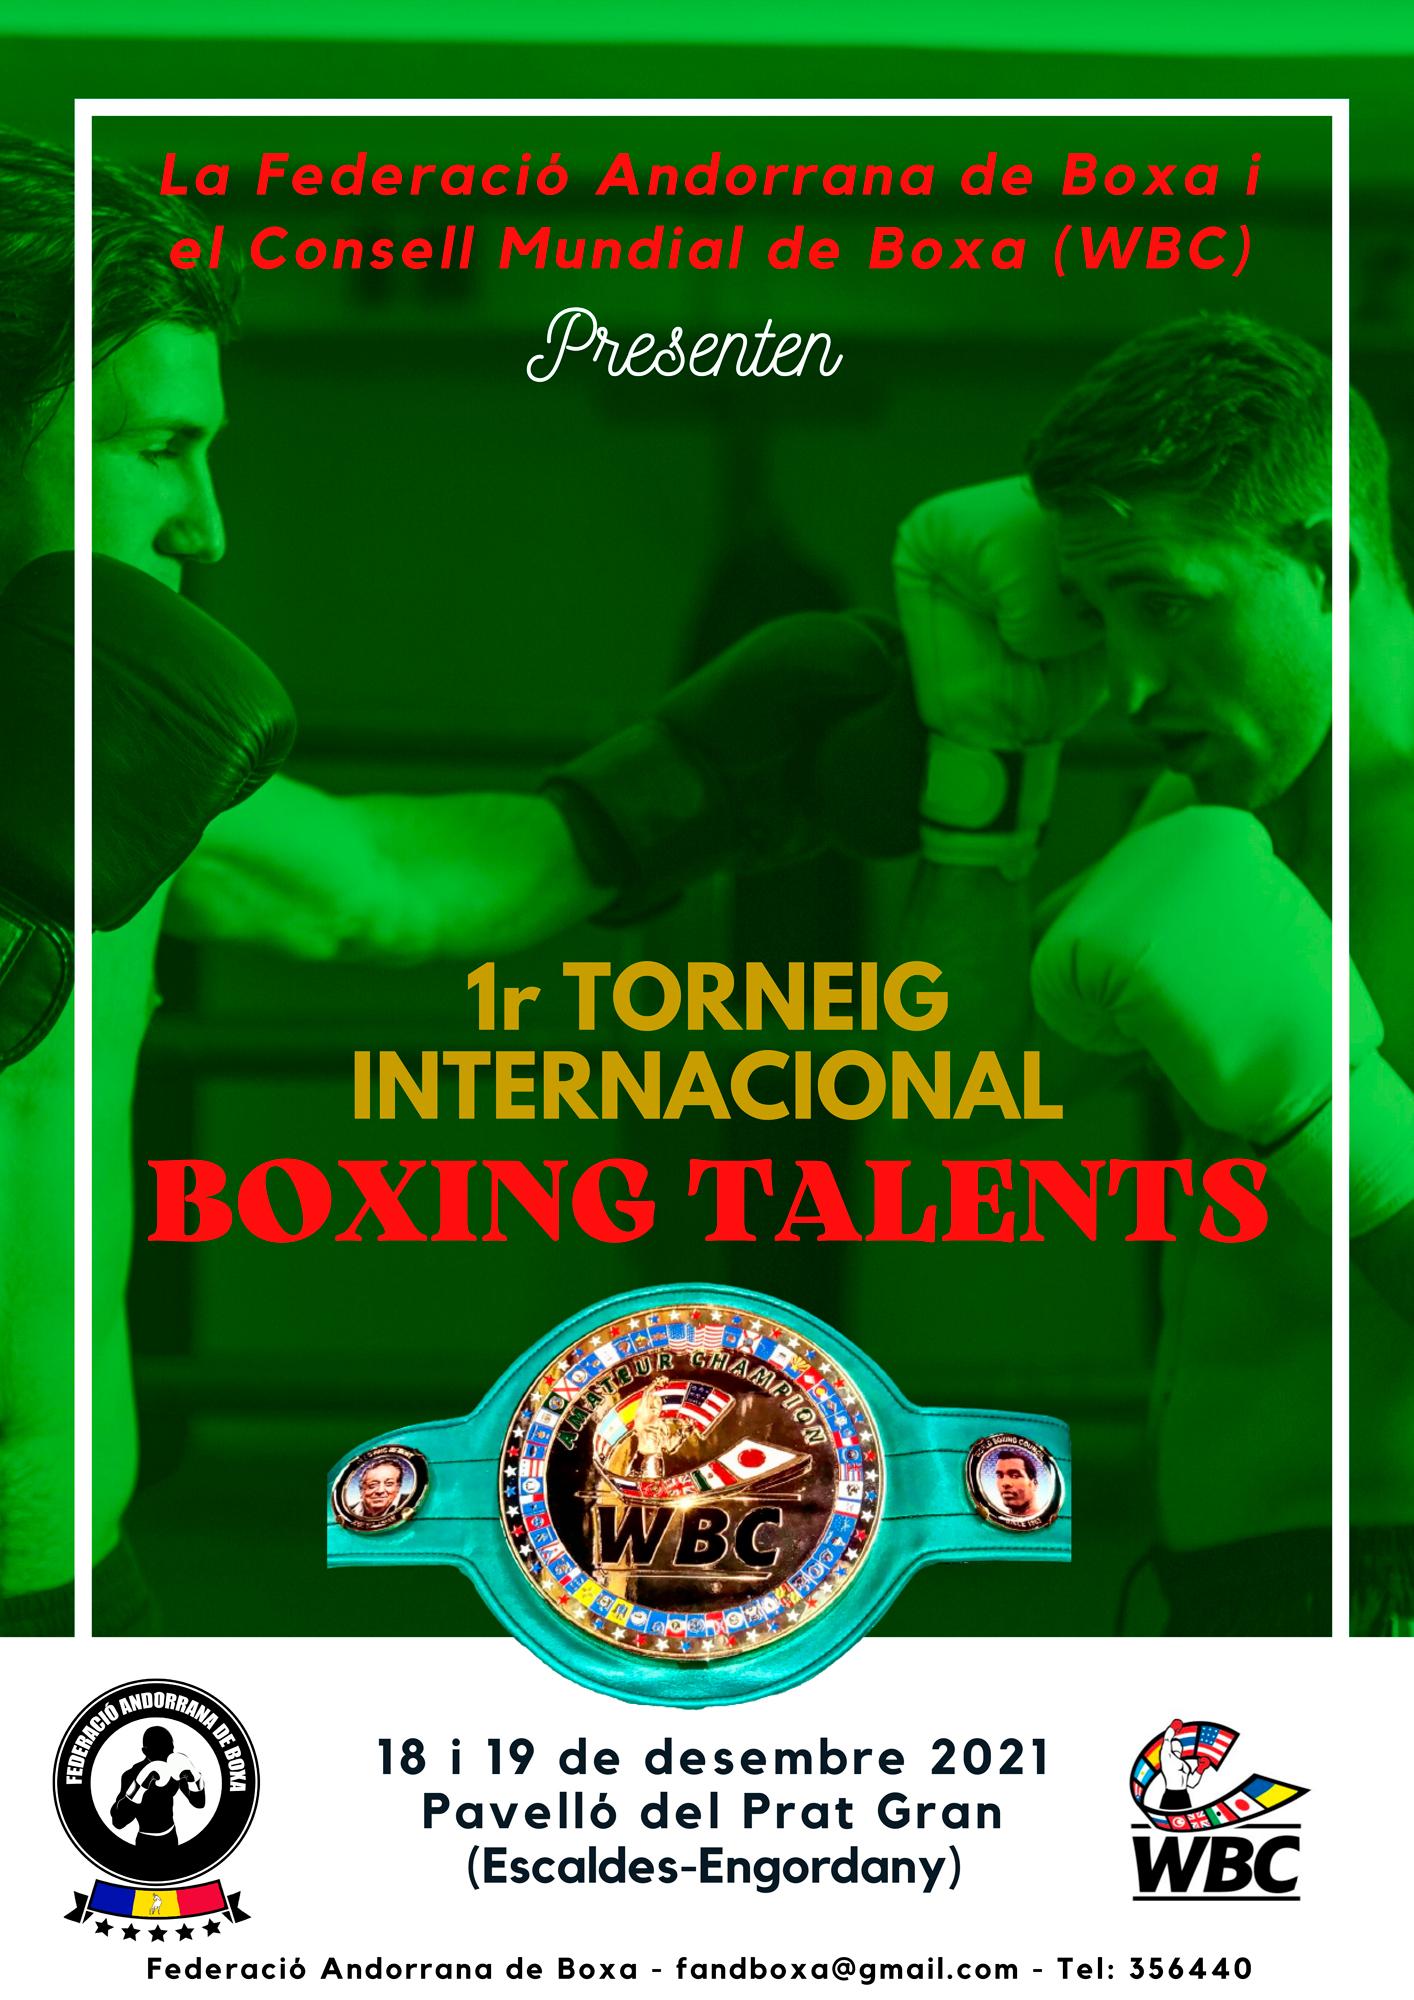 https://suljosblog.com/suljos/wp-content/uploads/2021/10/torneig-internacional-boxing-talents-1.jpg